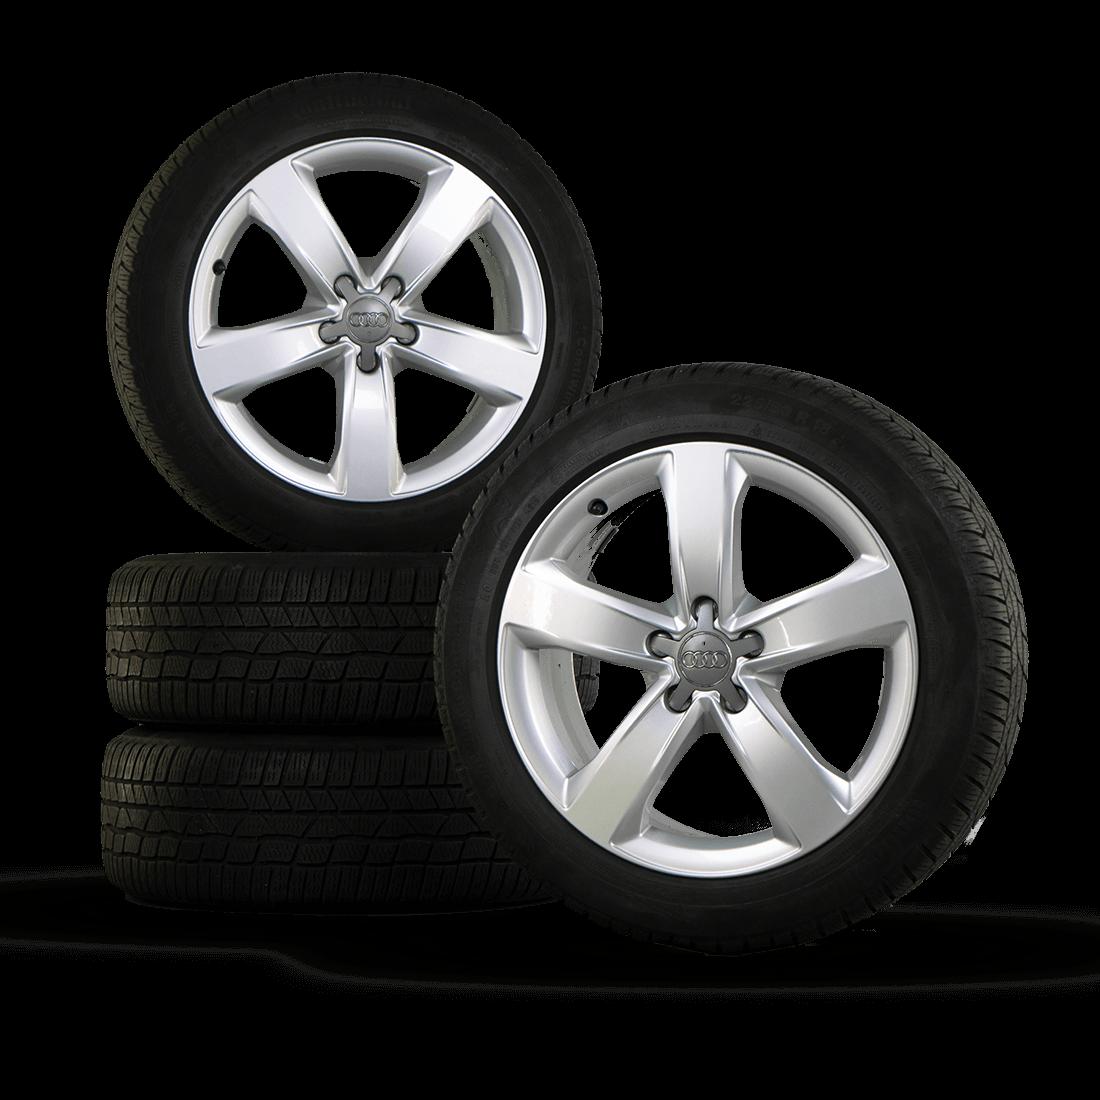 18 Inch Tires >> 18 Inch Aluminum Rims Winter Tires Audi A6 4g Winter Wheels S Line Winter Wheel